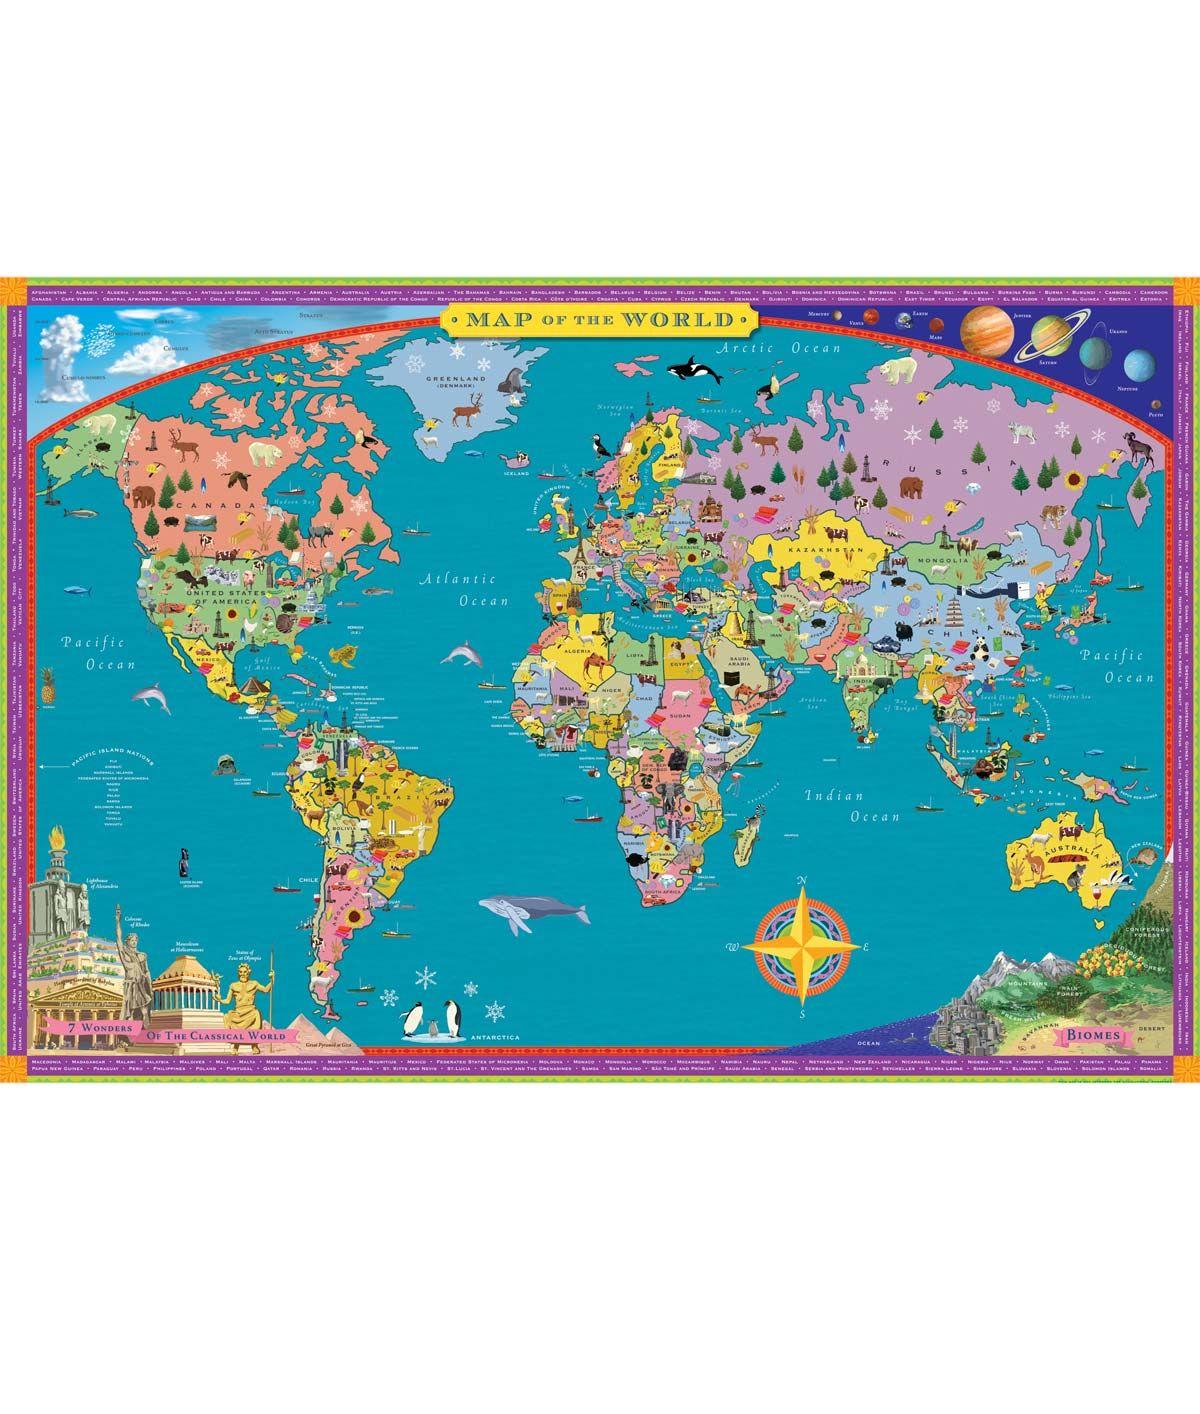 CHILDREN'S WORLD MAP | Kids Wall Map | UncommonGoods | Pre ... on world shipping lanes, world most beautiful nature, world travel, world atlas, world hunger, world records, world globe, world of warships, world projection, world history, world border, world statistics, world glode, world wallpaper, world earth, world war, world culture, world wide web, world flag, world military,